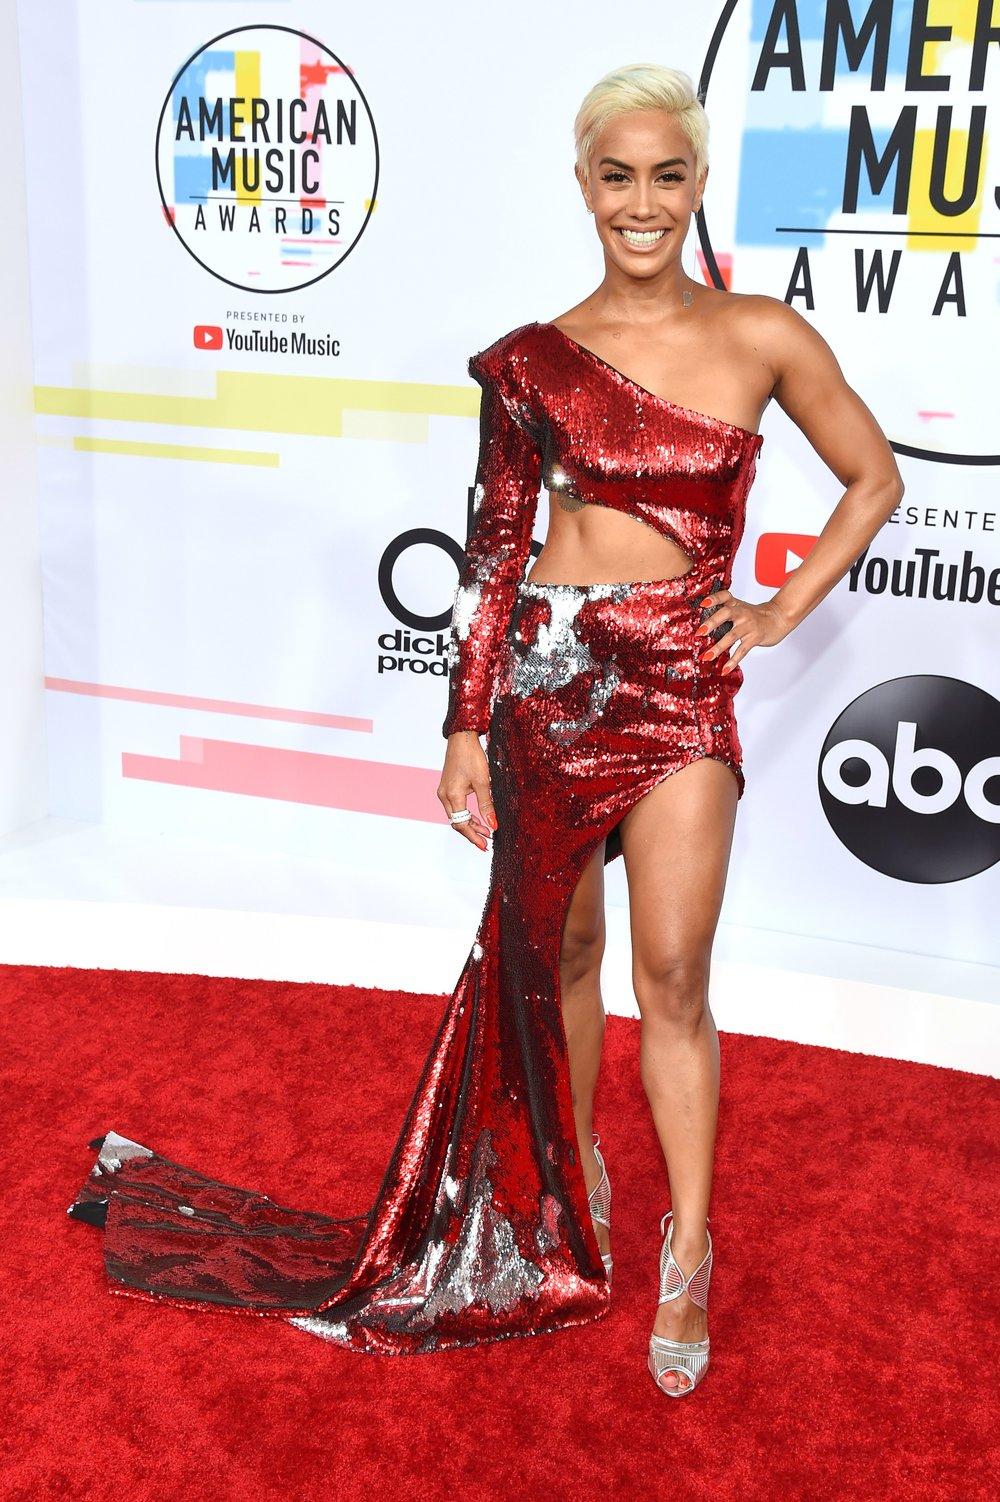 AMERICAN MUSIC AWARDS 2018 RED CARPET SIBLEY SCOLES.jpg